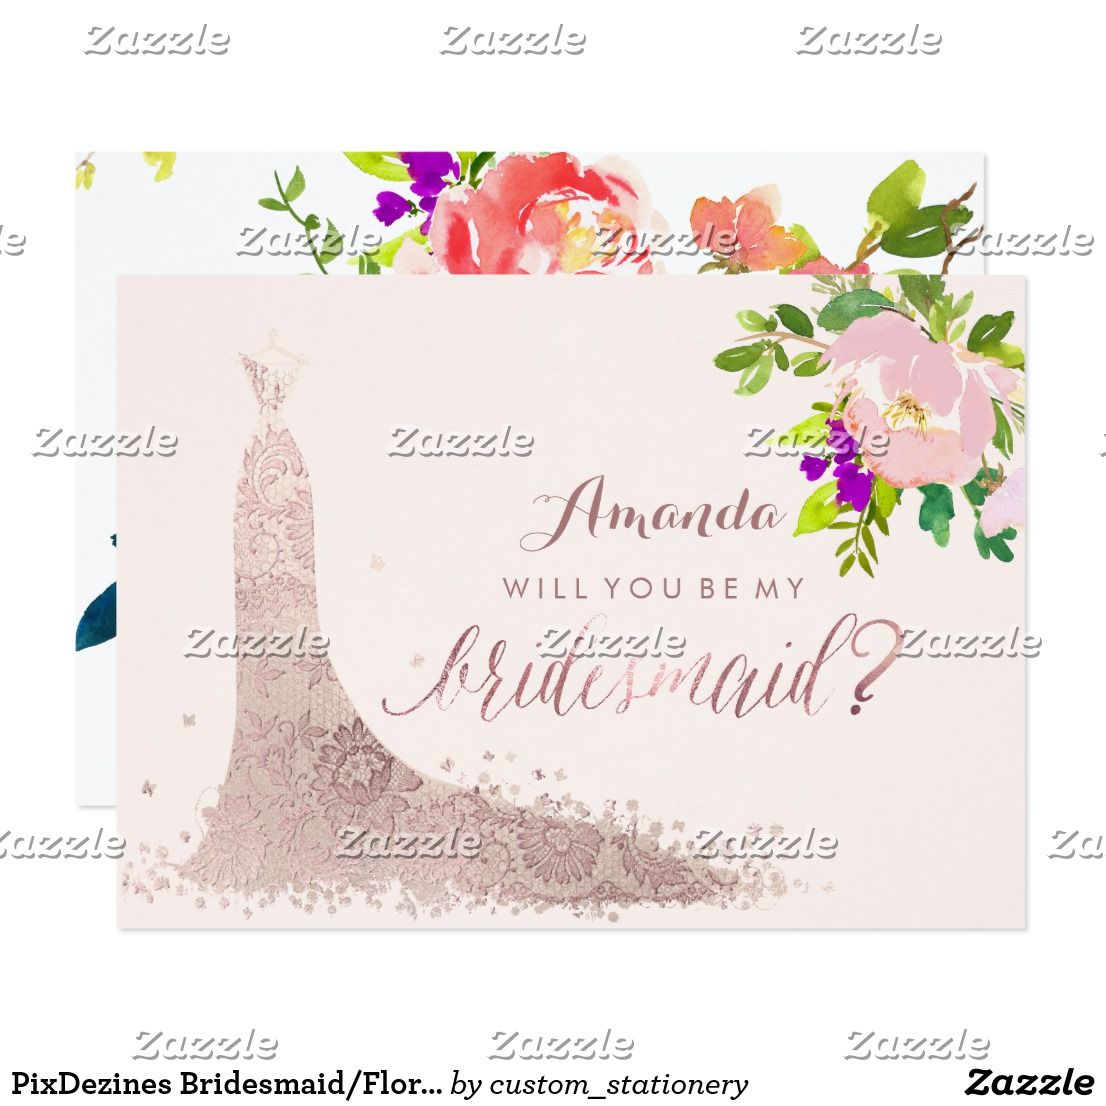 Pixdezines Bridesmaid Floral Watercolor Spring Card Lace Wedding